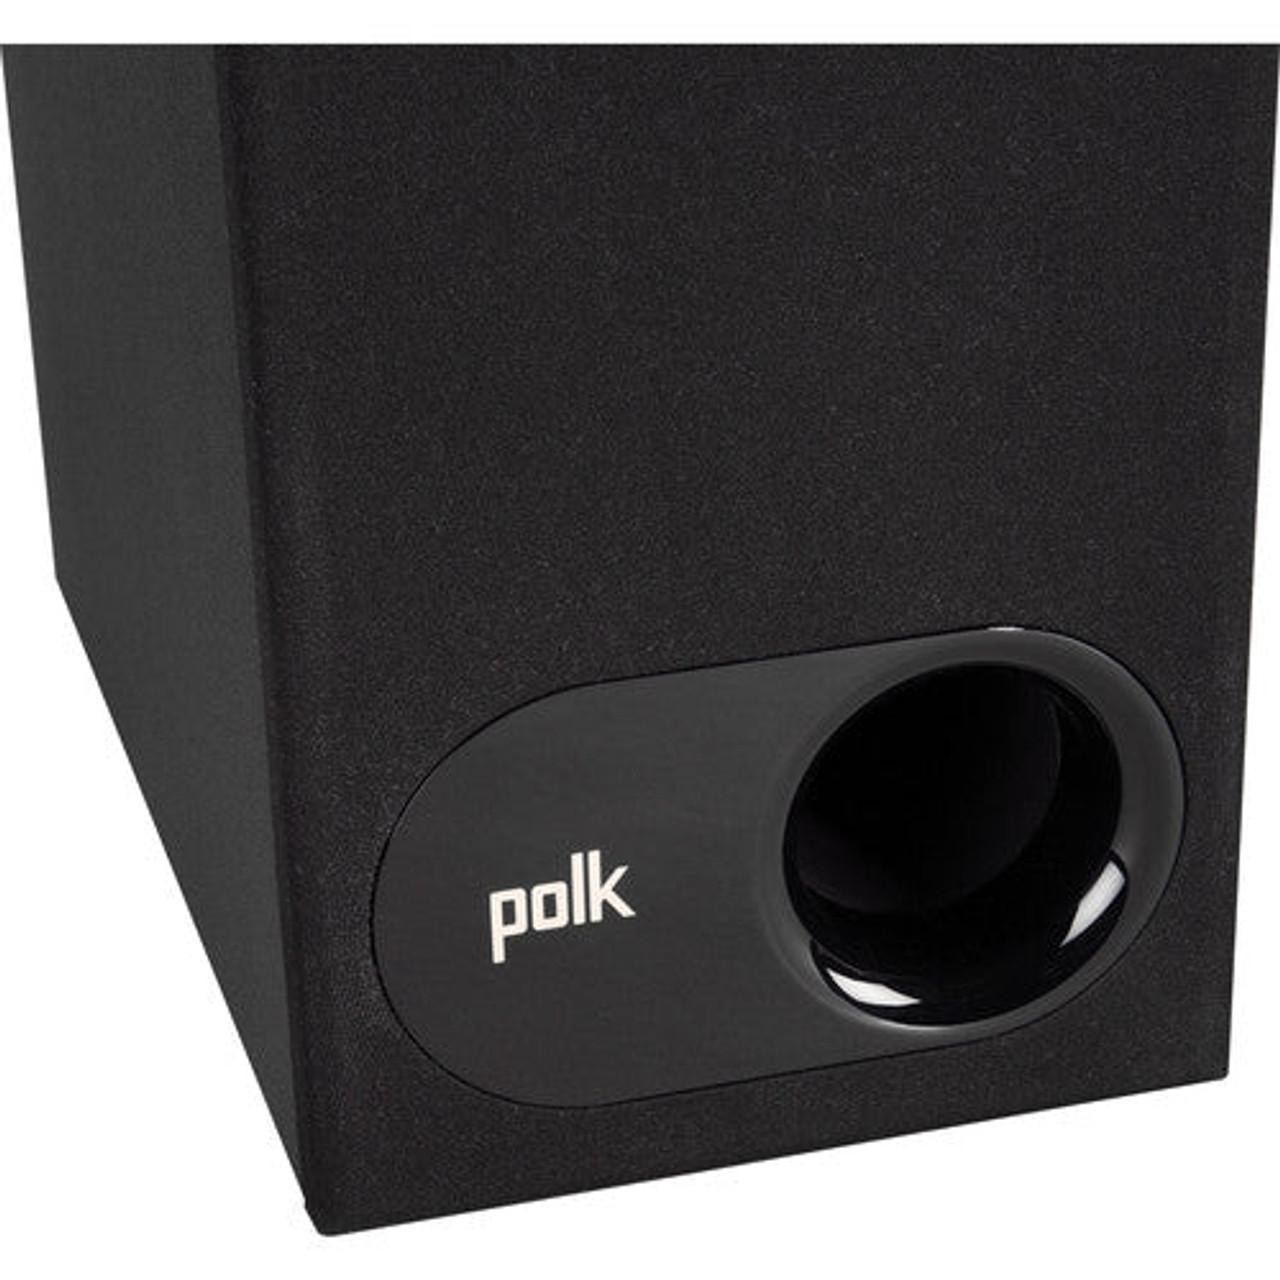 Polk Audio PAM6214-A Signa S2 2.1Ch Ultra-Slim TV Soundbar System